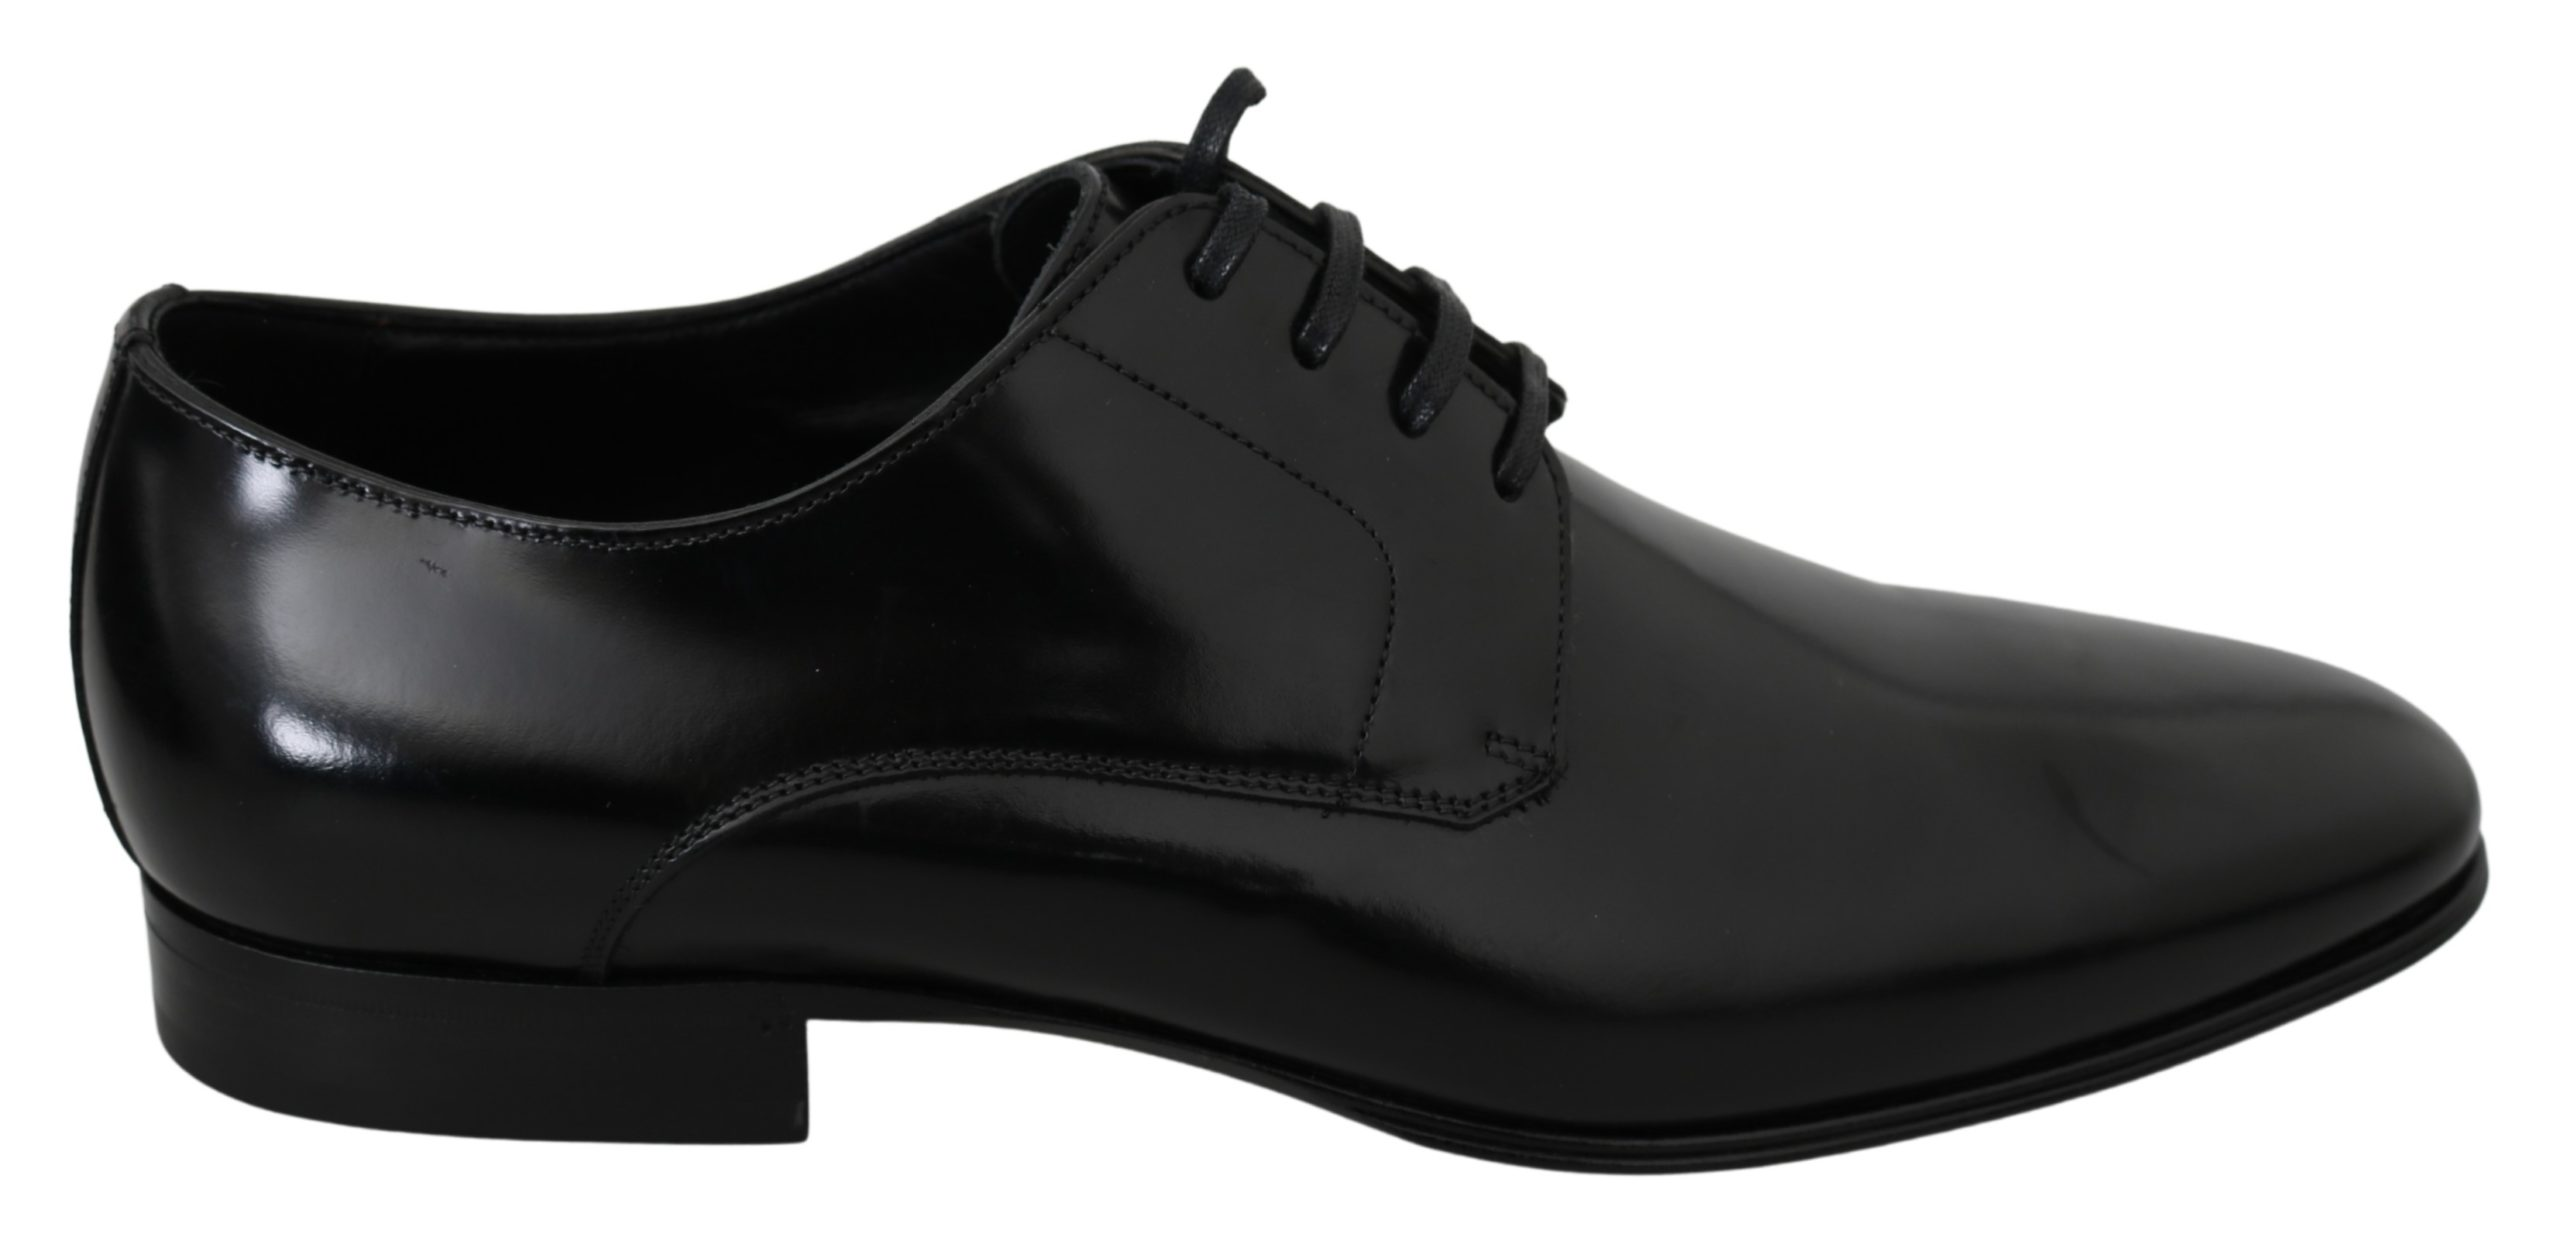 Dolce & Gabbana Men's Solid Leather Derby Shoe Black MV2896 - EU41/US8